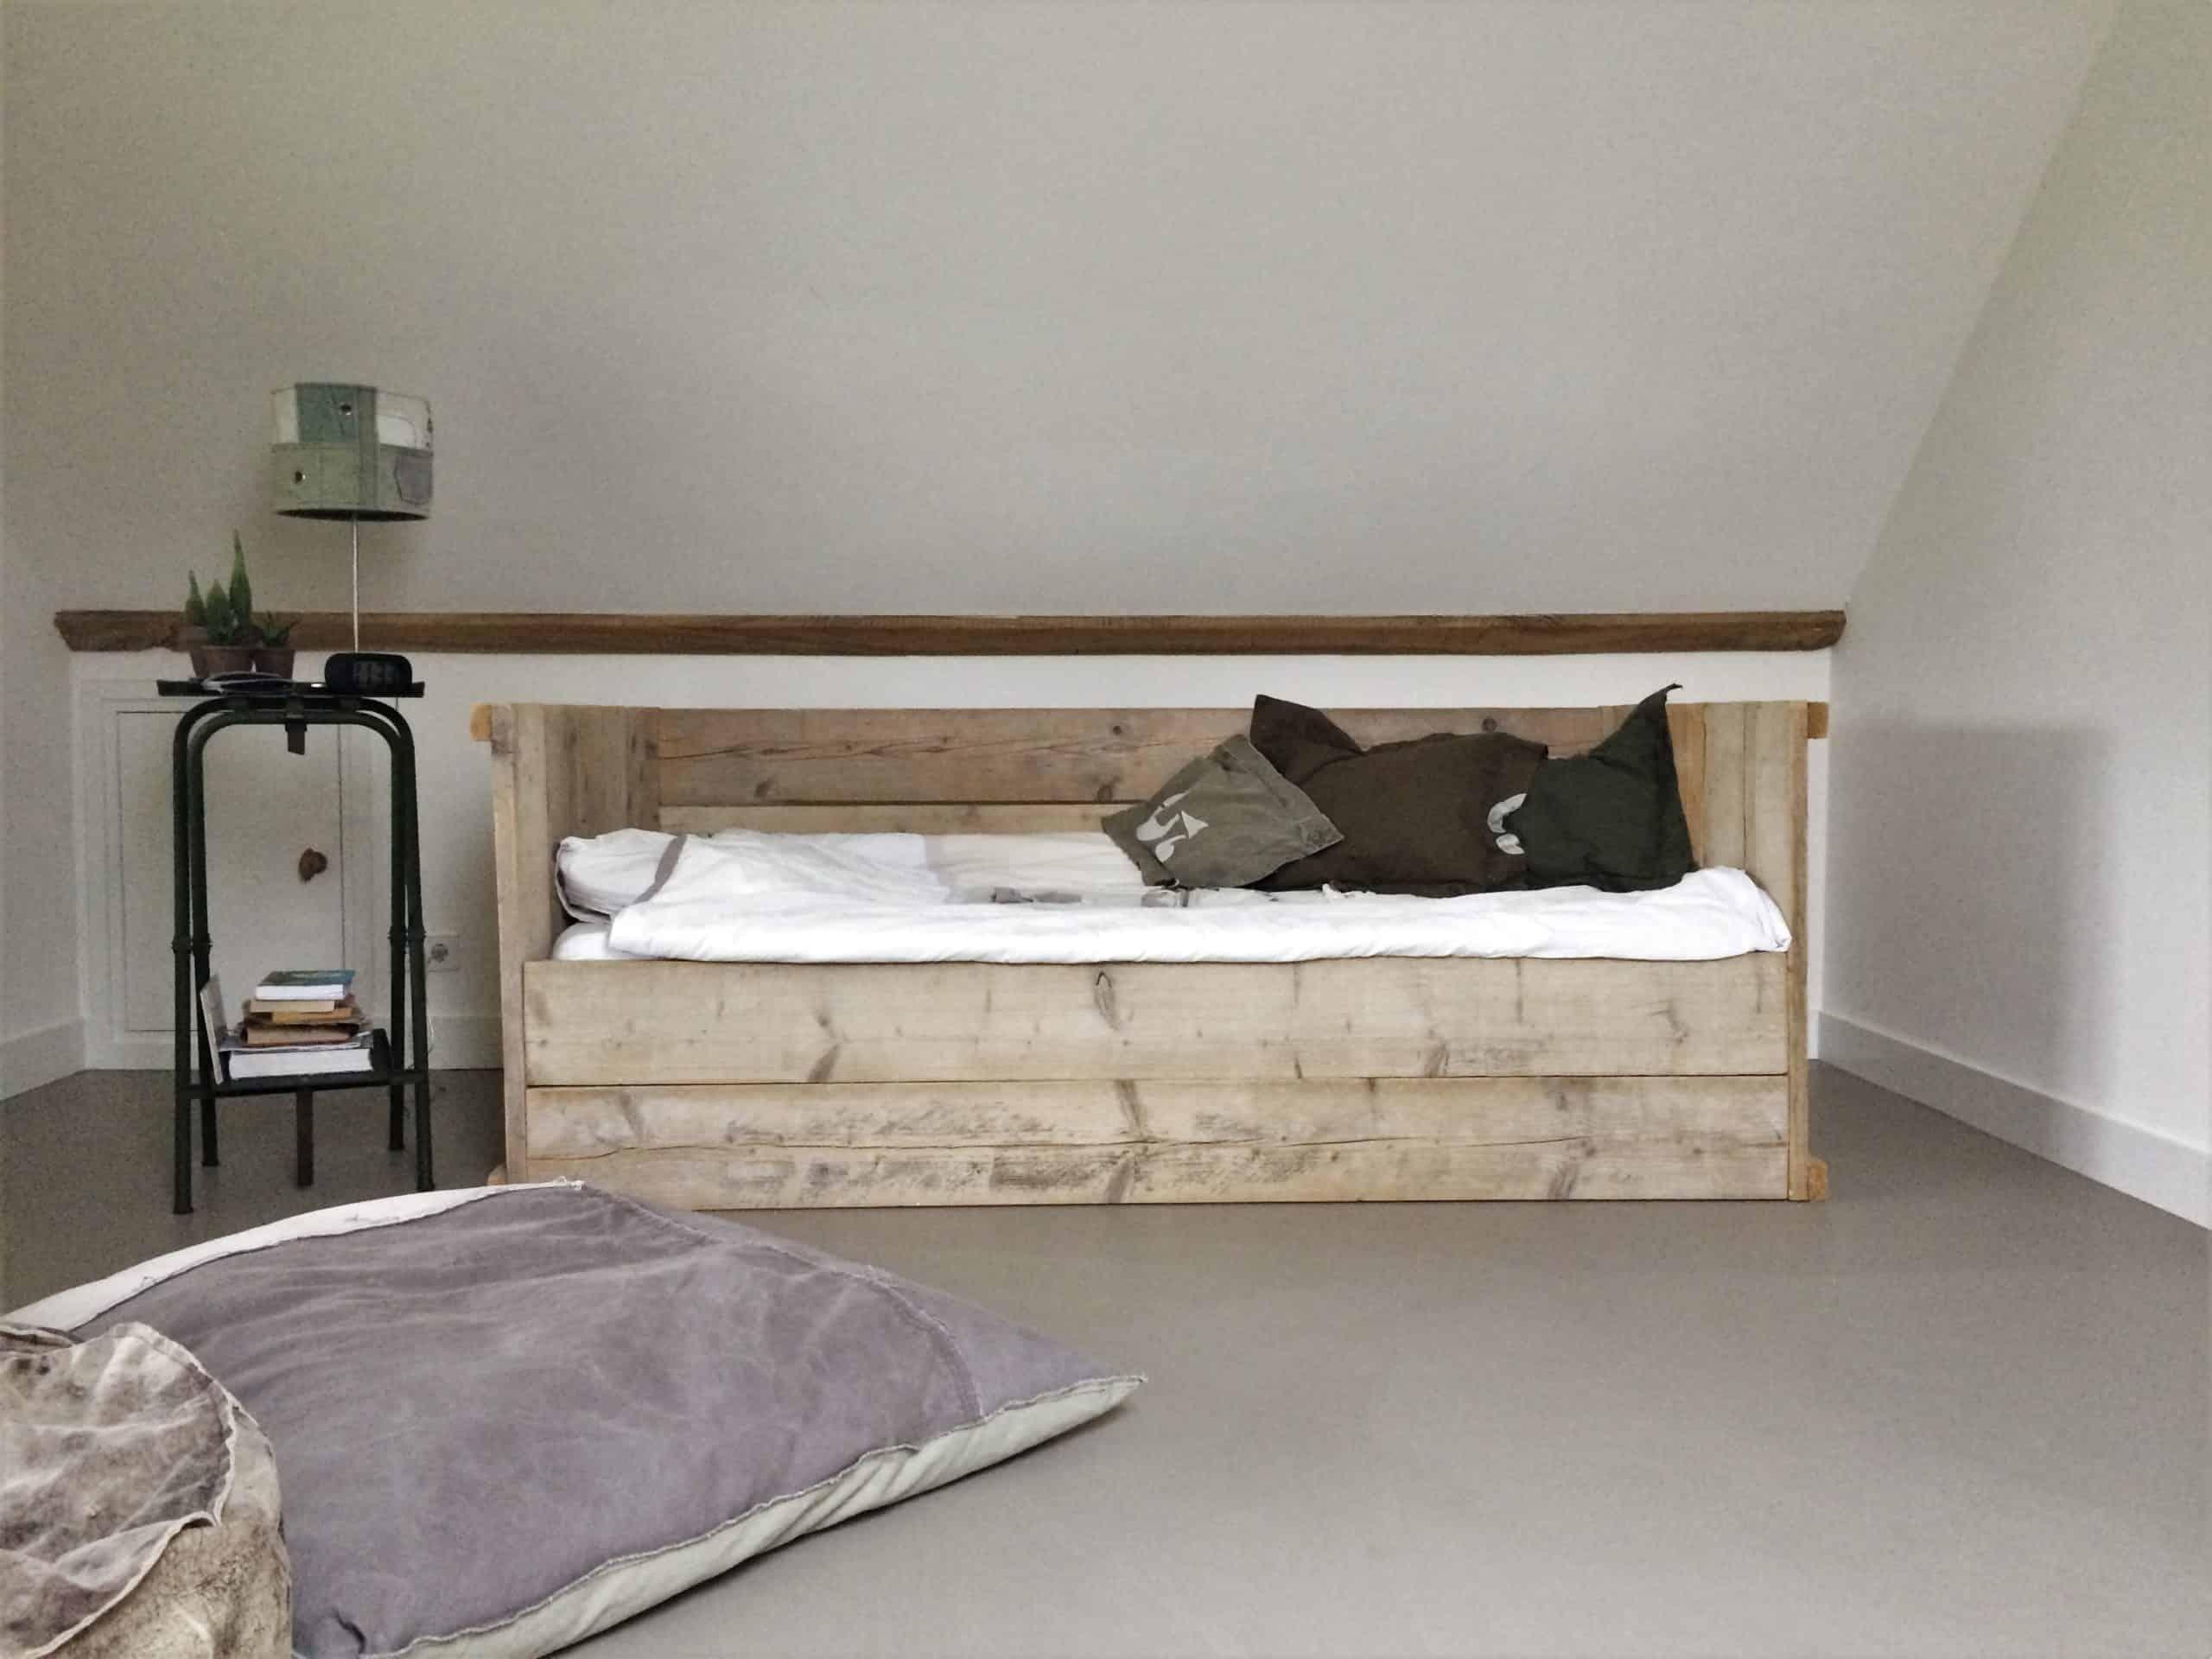 gietvloer slaapkamer, betonlook slaapkamer